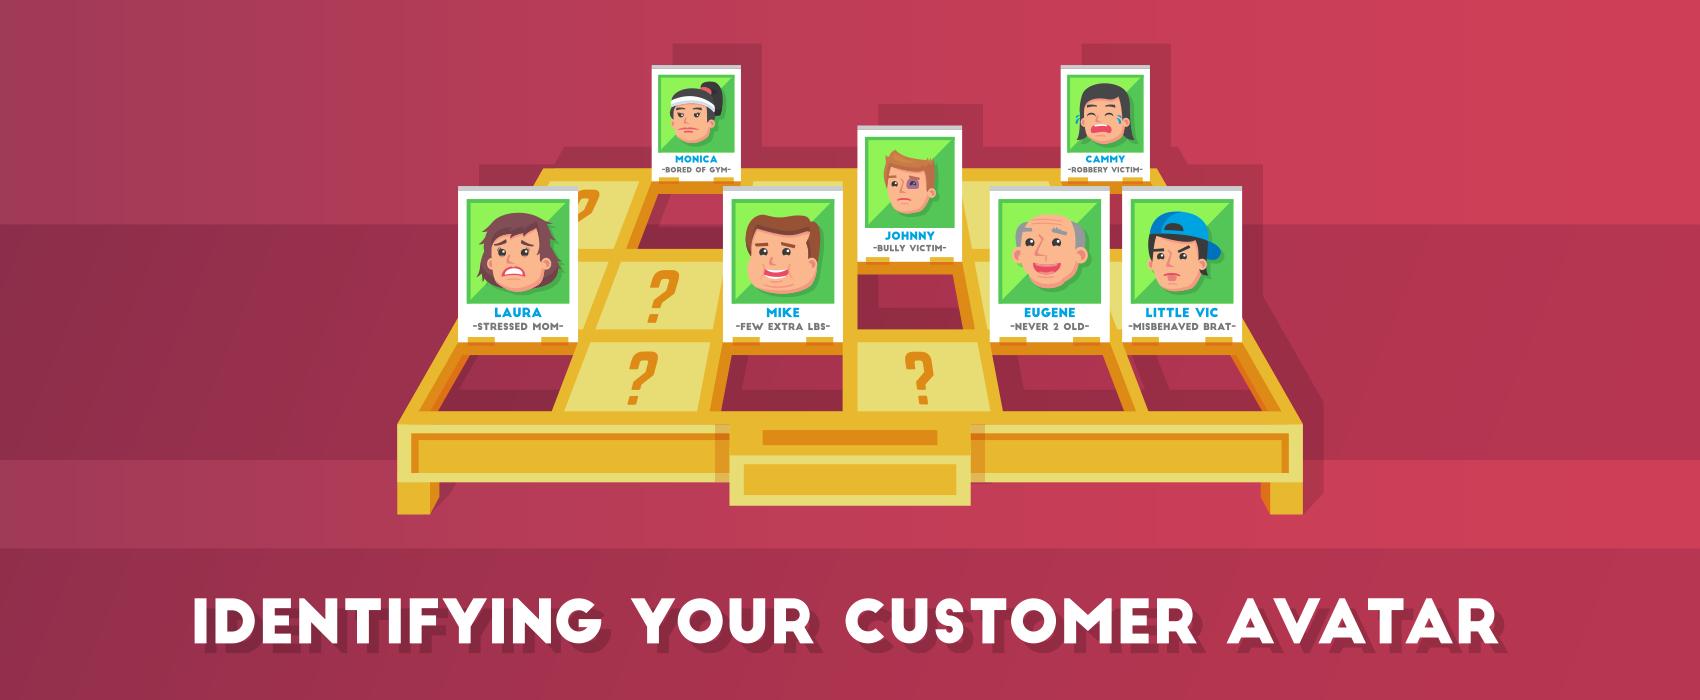 Dojo Digital Banner #3 :  Customer Avatar